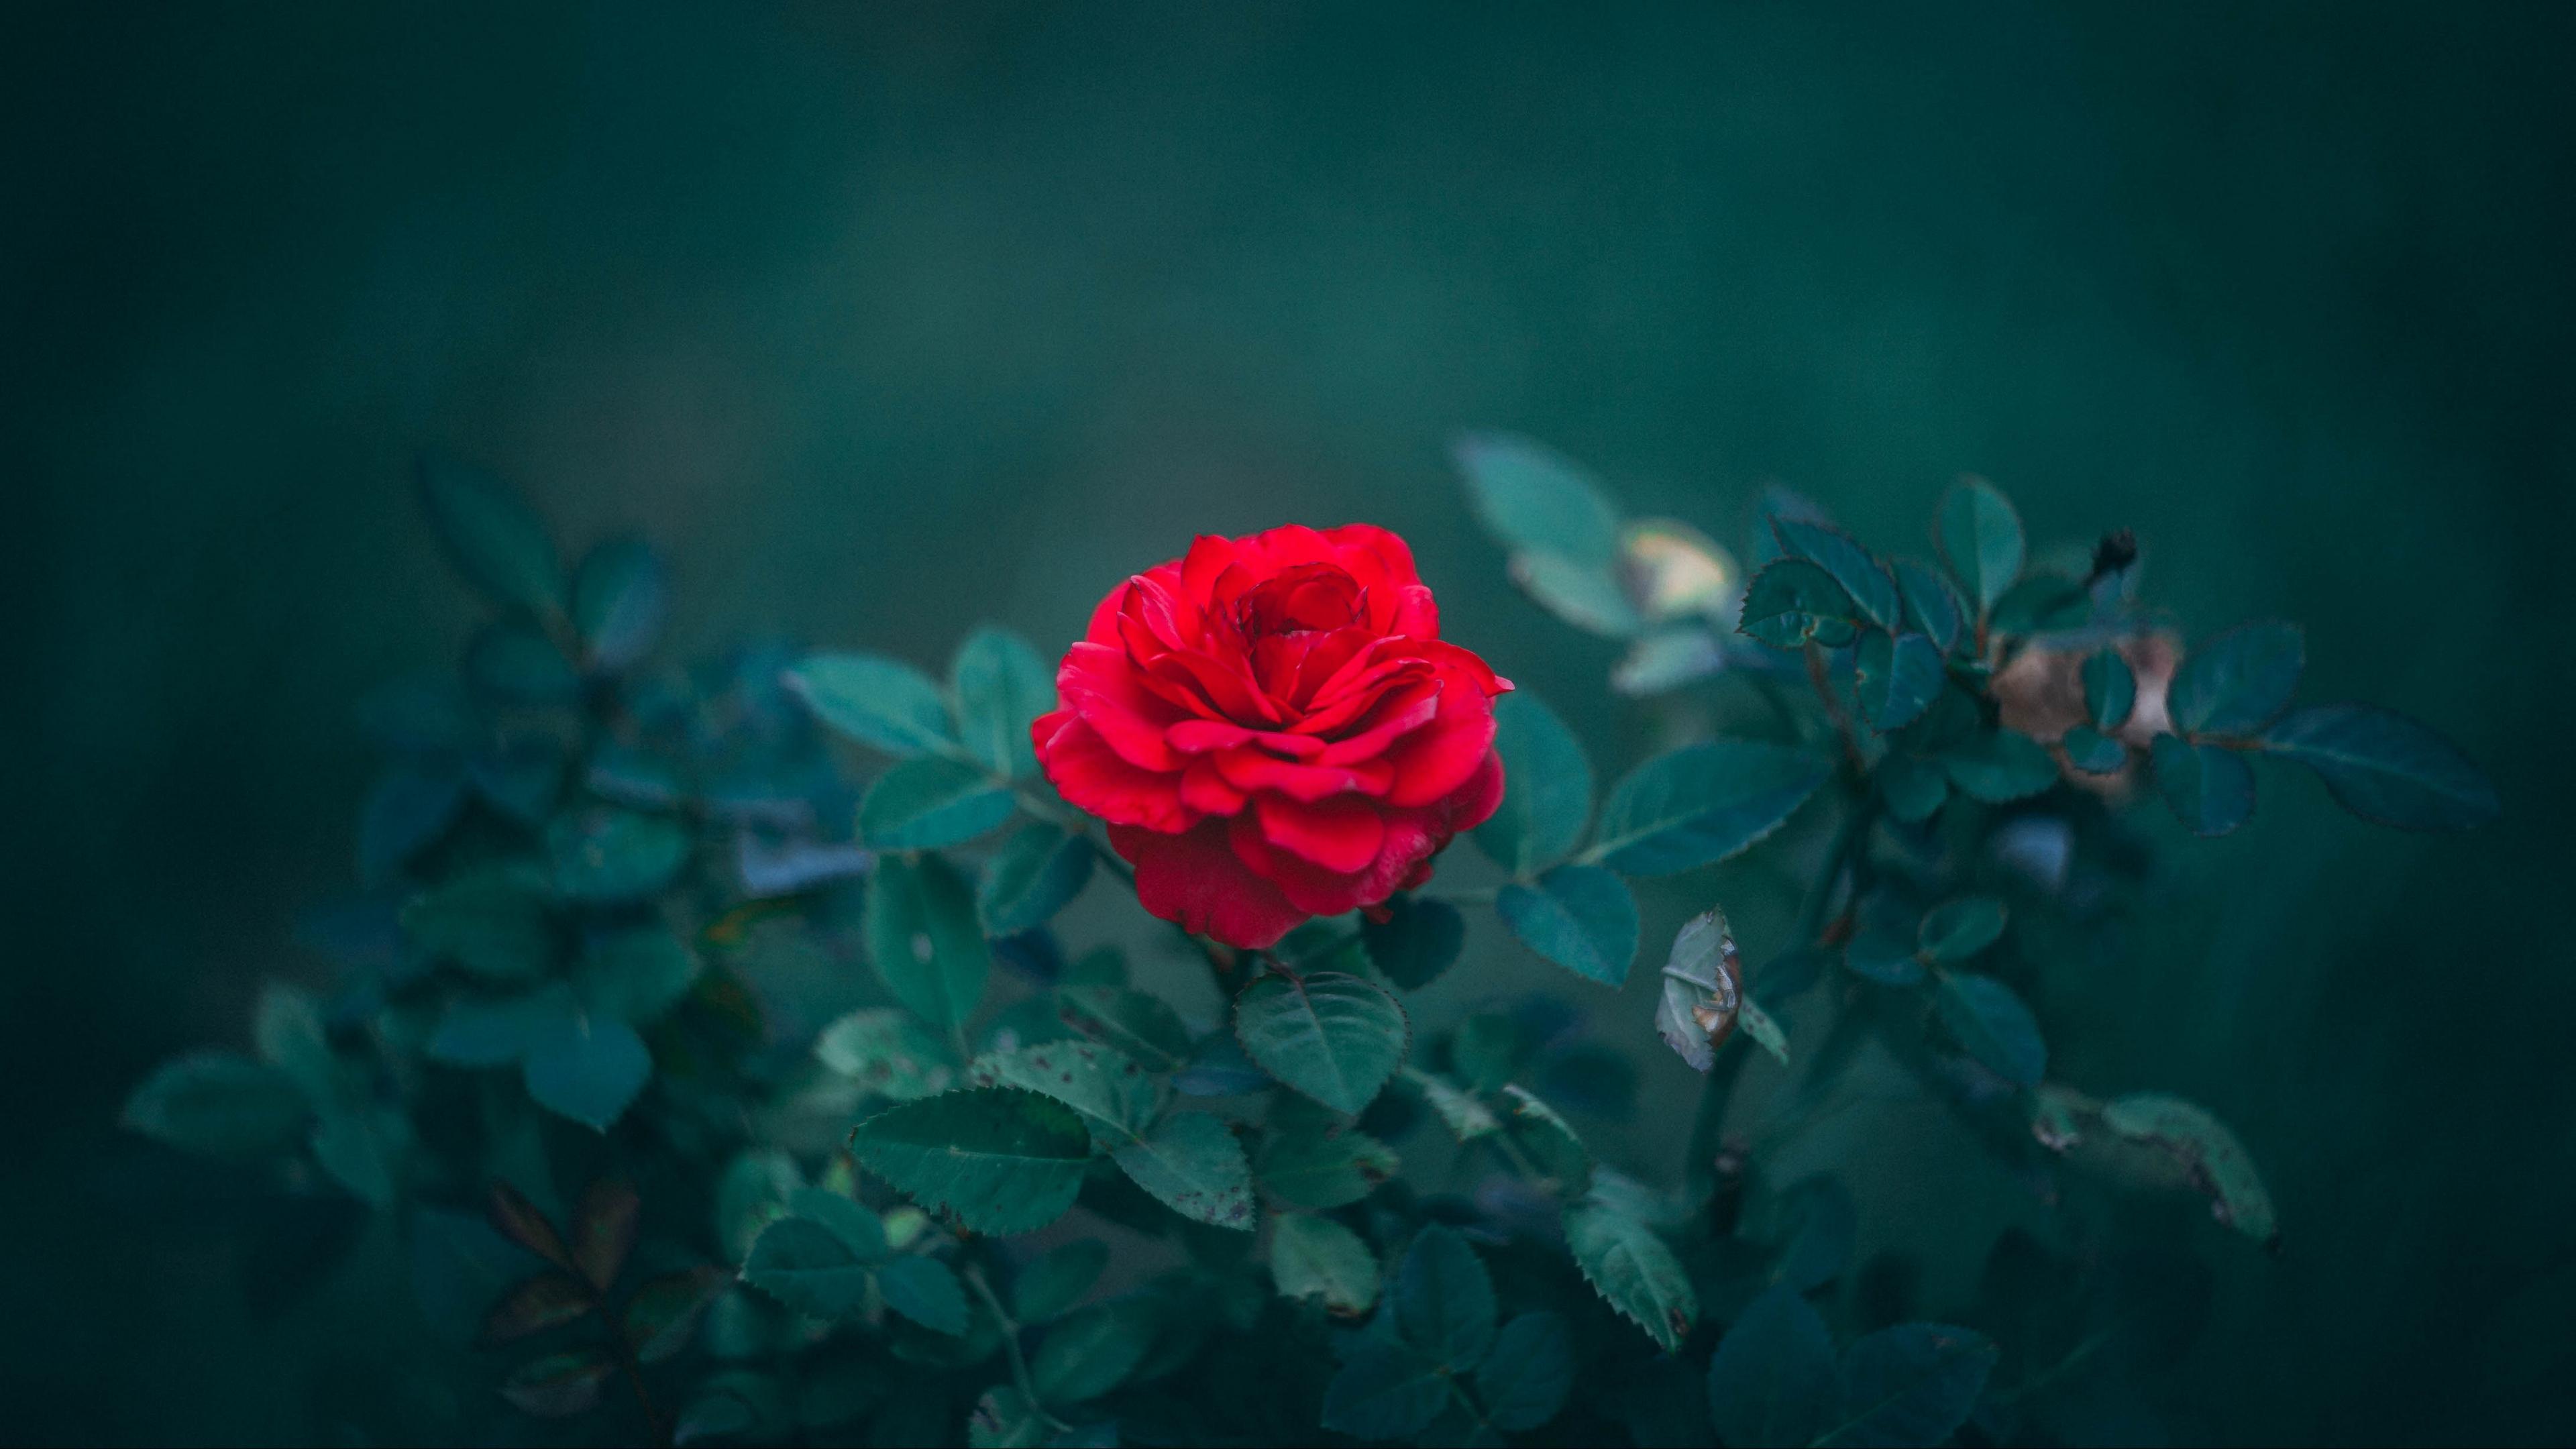 rose bud red bush blur leaves 4k 1540065248 - rose, bud, red, bush, blur, leaves 4k - Rose, red, bud